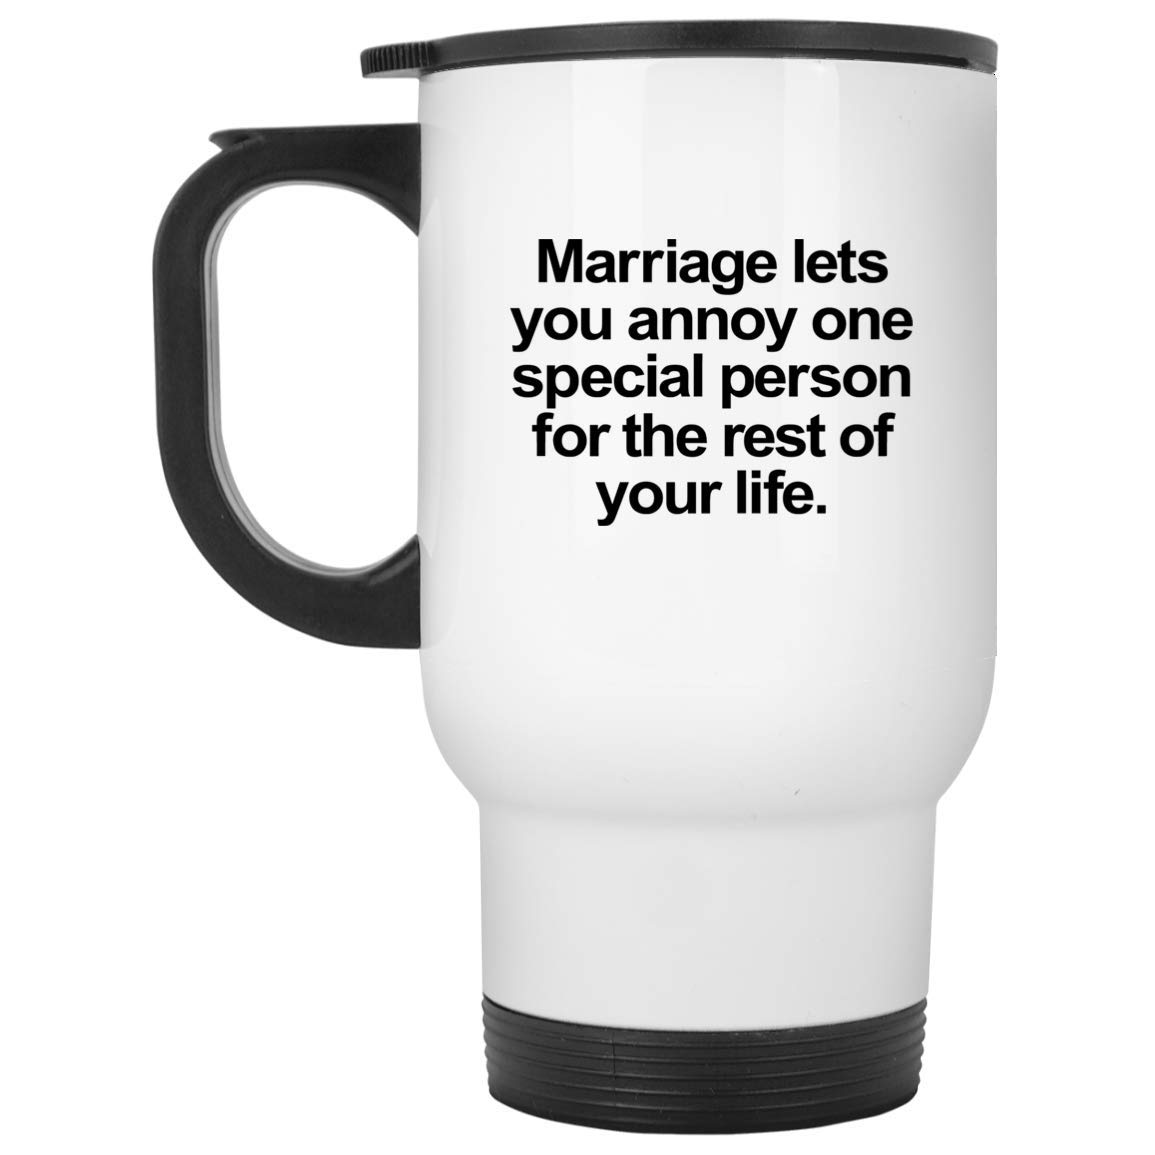 Funny Wife トラベルマグ - 14オンス ホワイトステンレススチール - 面白いノベルティギフトアイデア Happy Busy Proud Strong Single Greatest Future Coolest - 100406 B07L8M2HC2